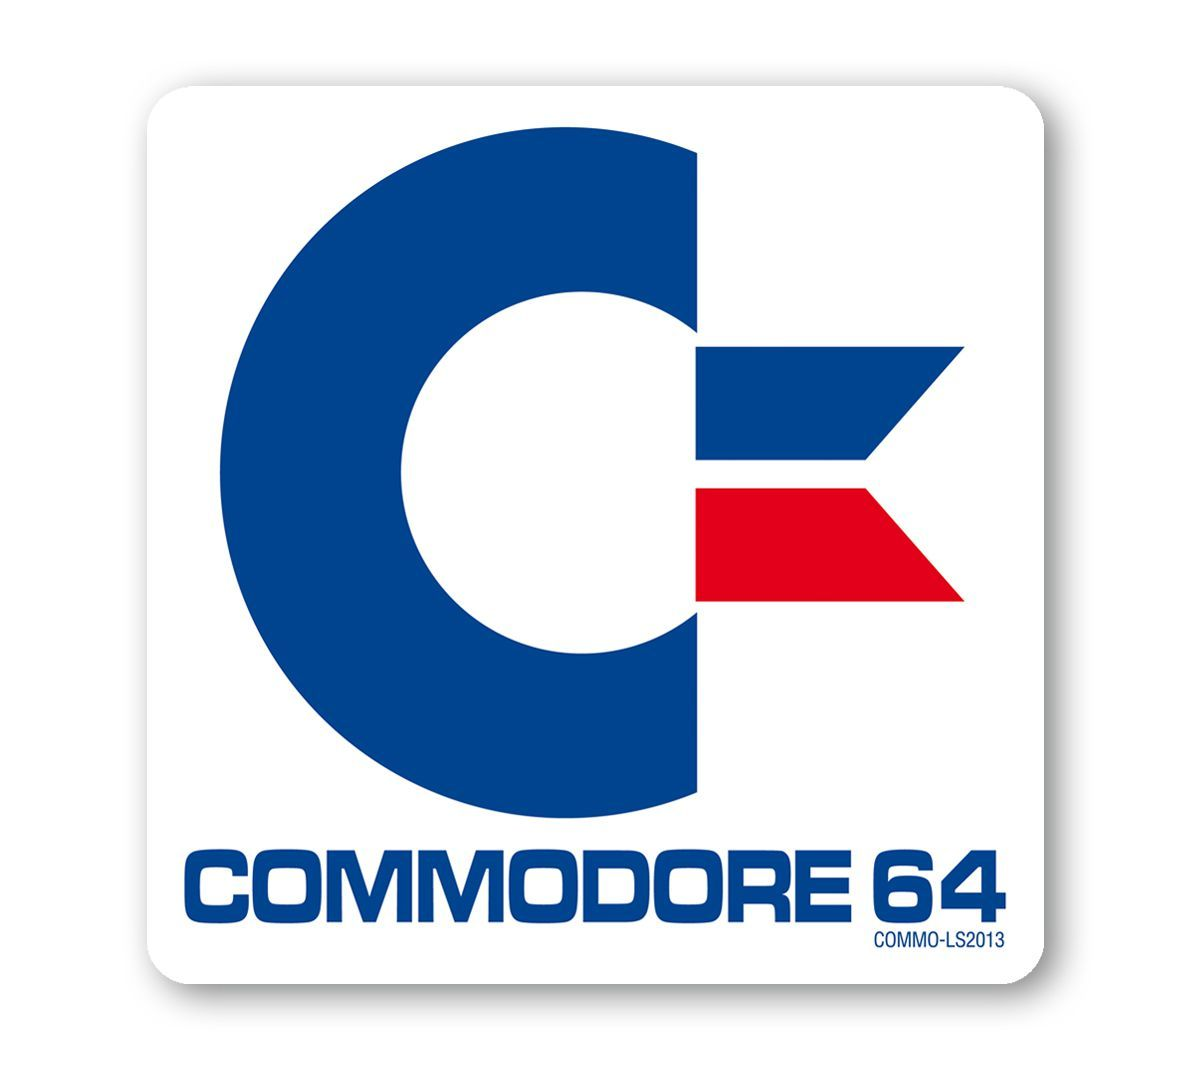 commodore 64 untersetzer logoshirt fond memories